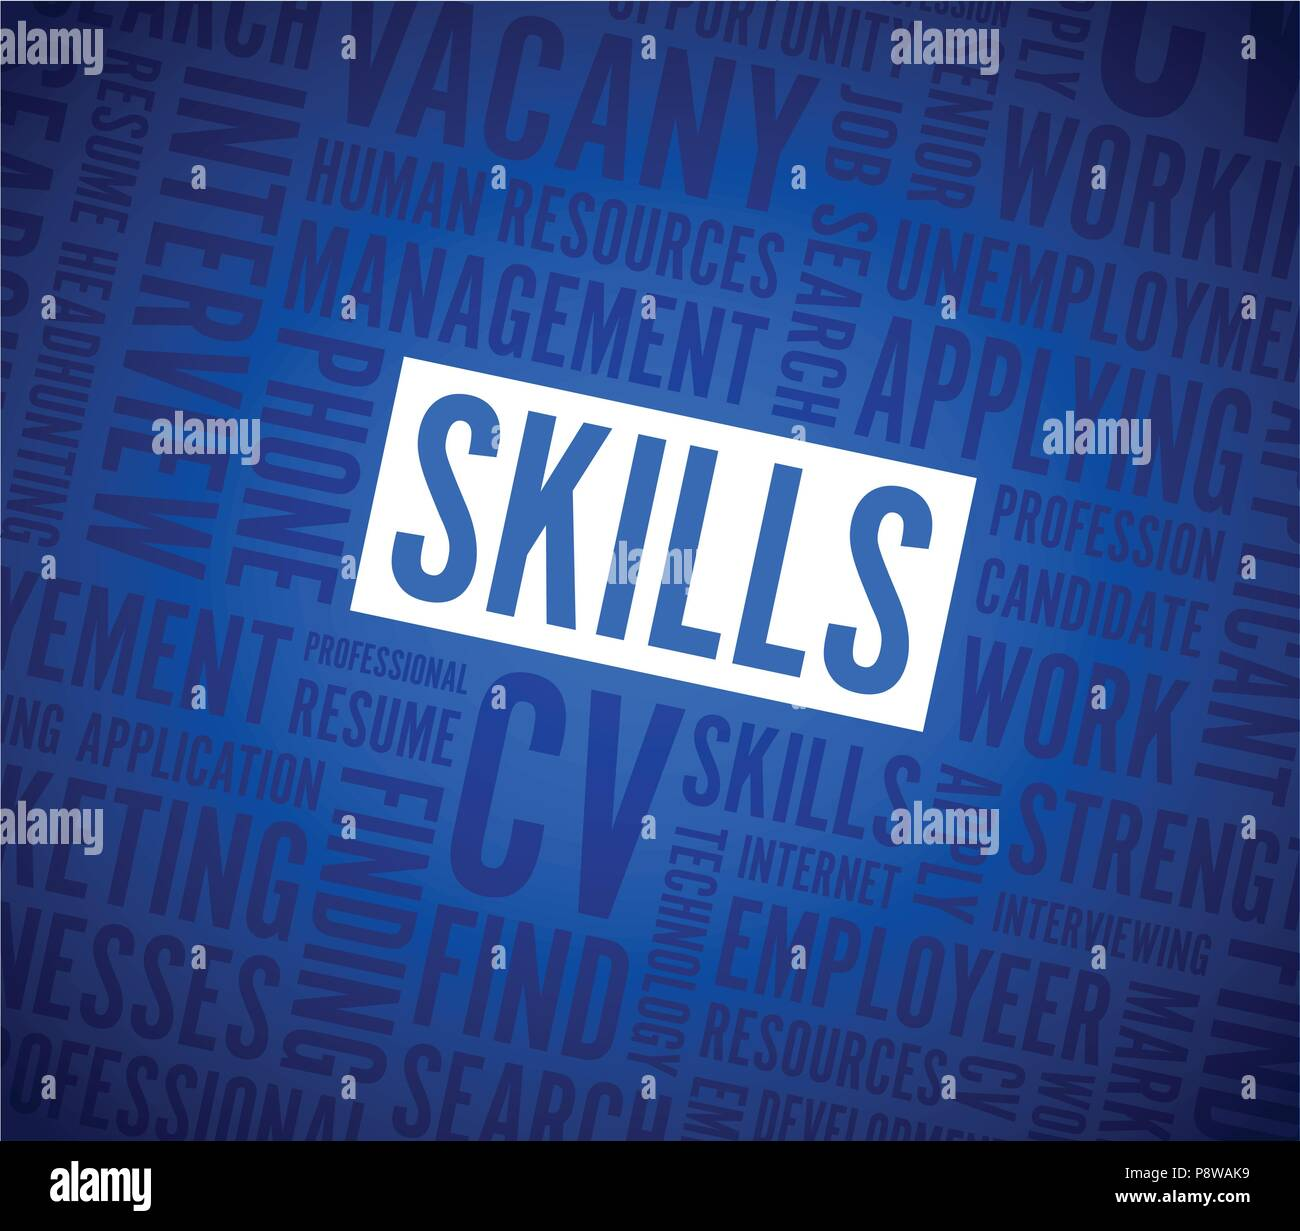 blue skills background text - Stock Image